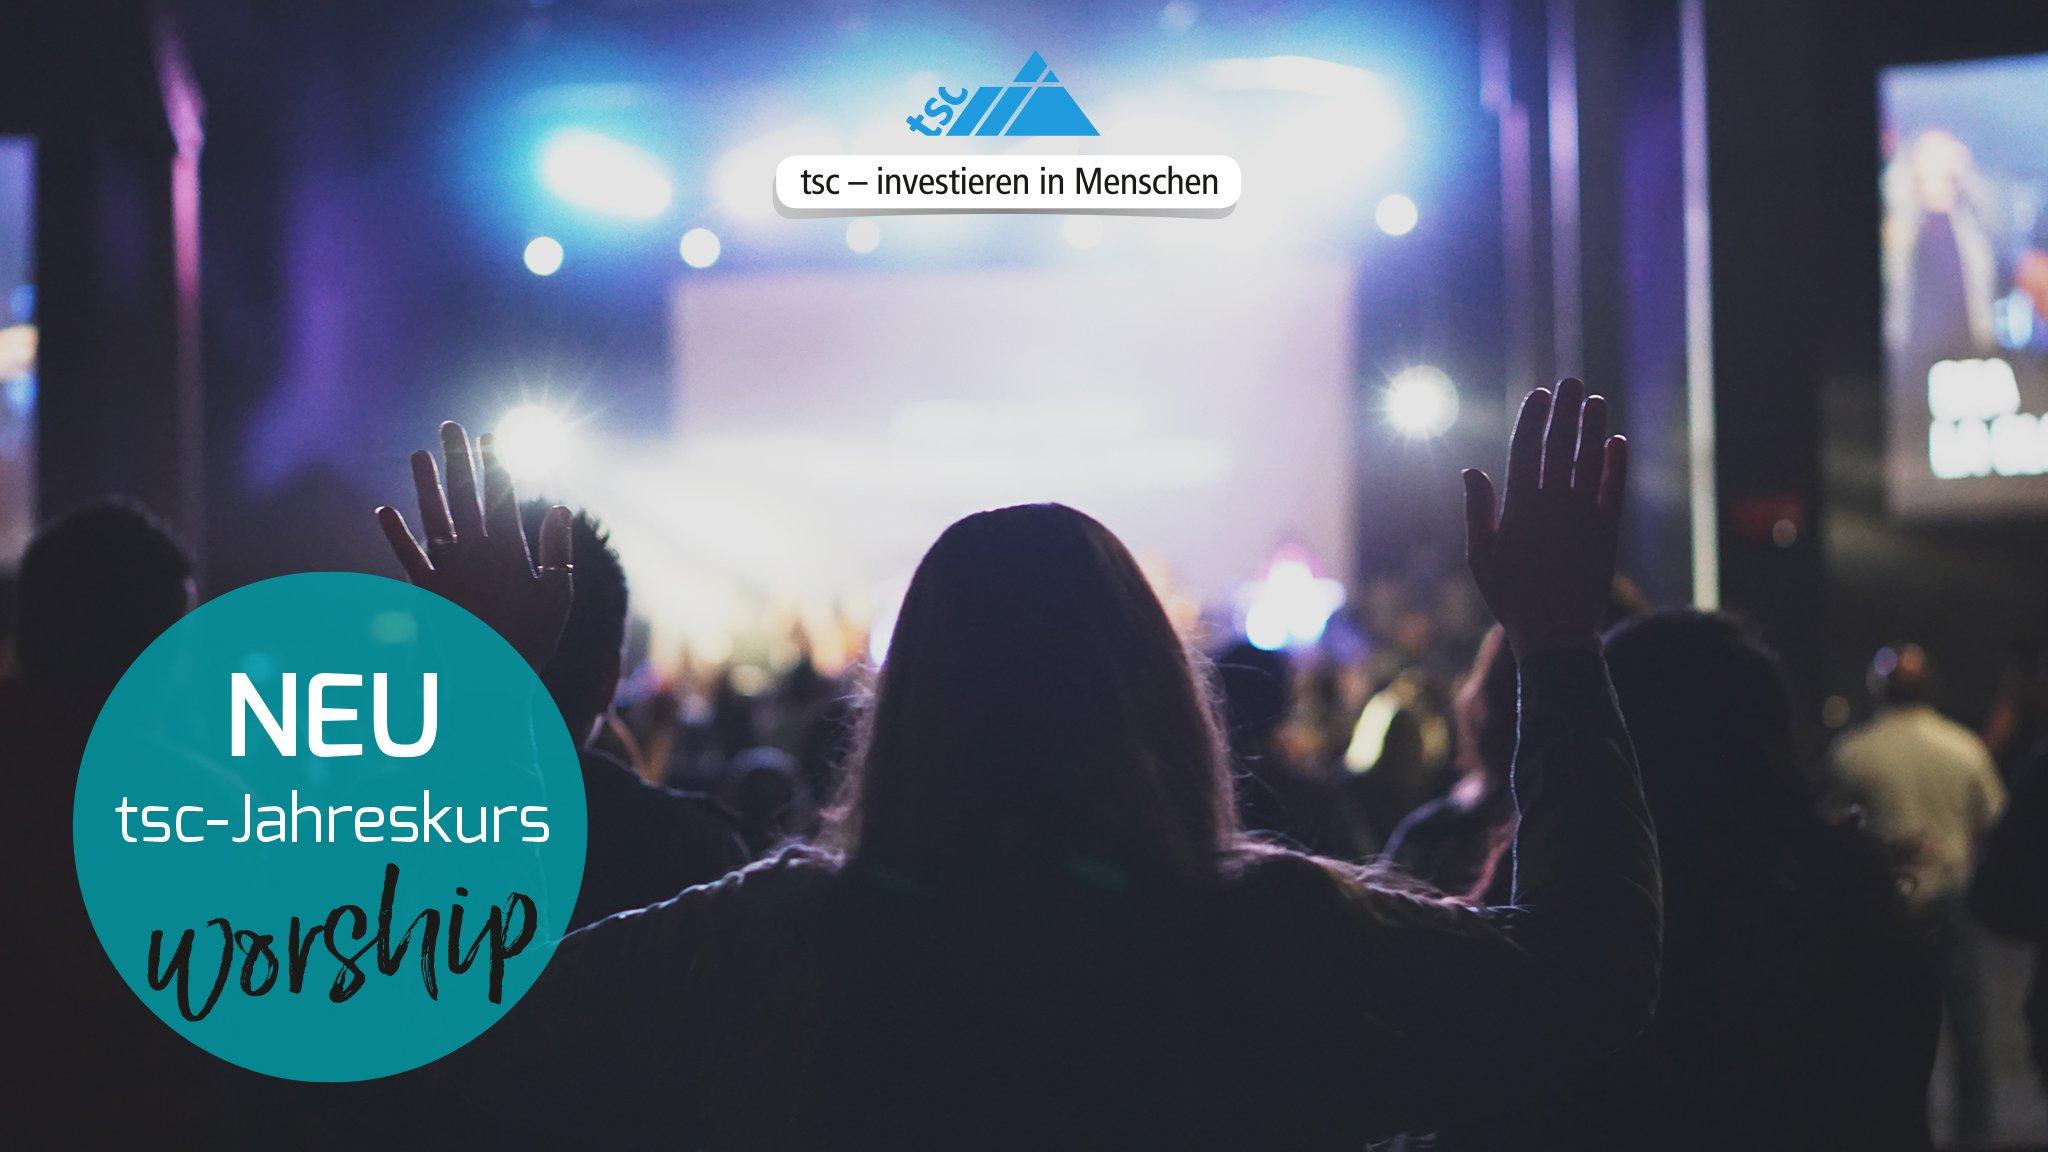 tsc-Jahreskurs Schwerpunkt Worship (2048x1152px)